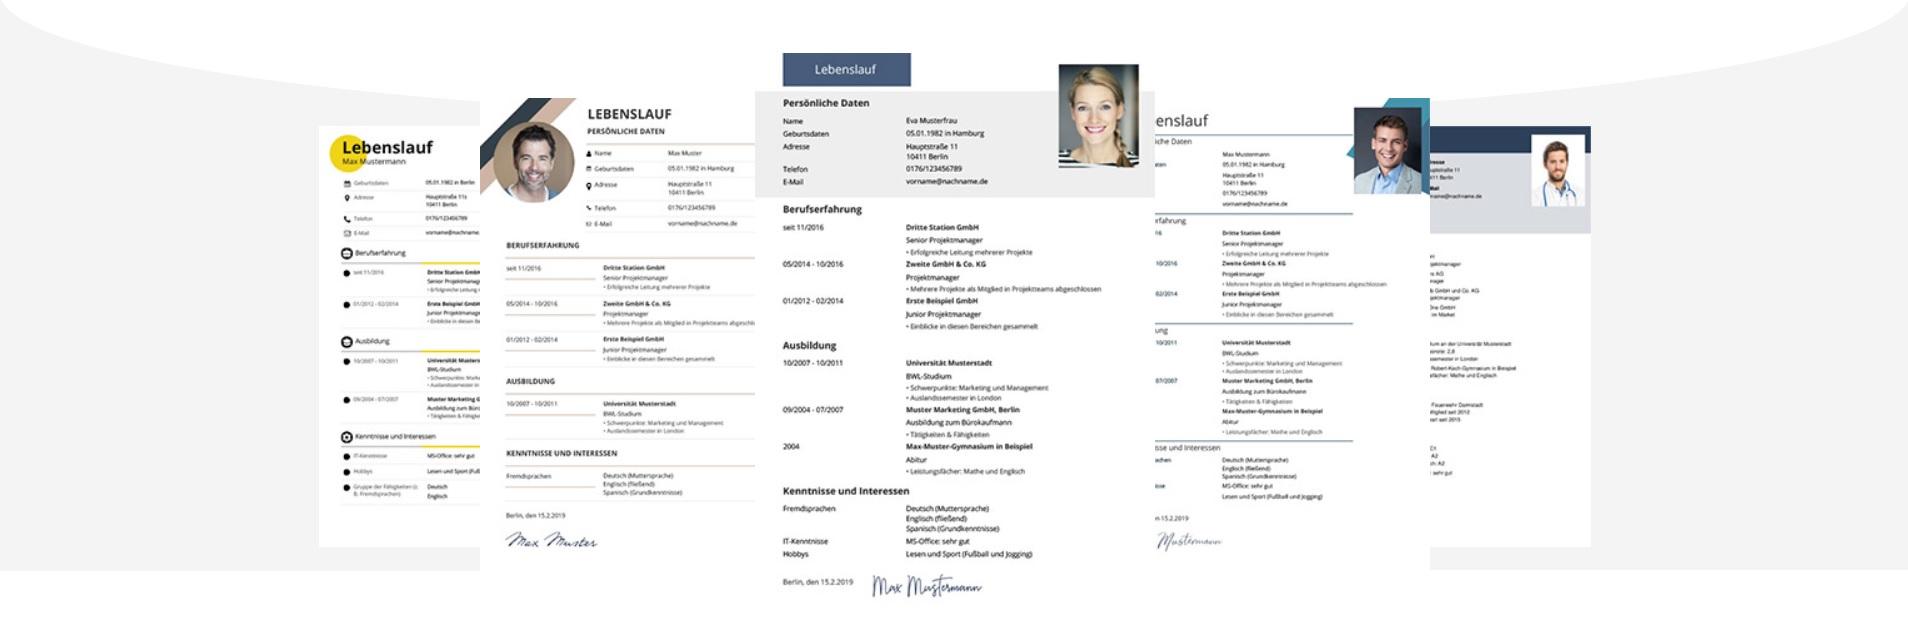 Liste aller forschenden Berufe